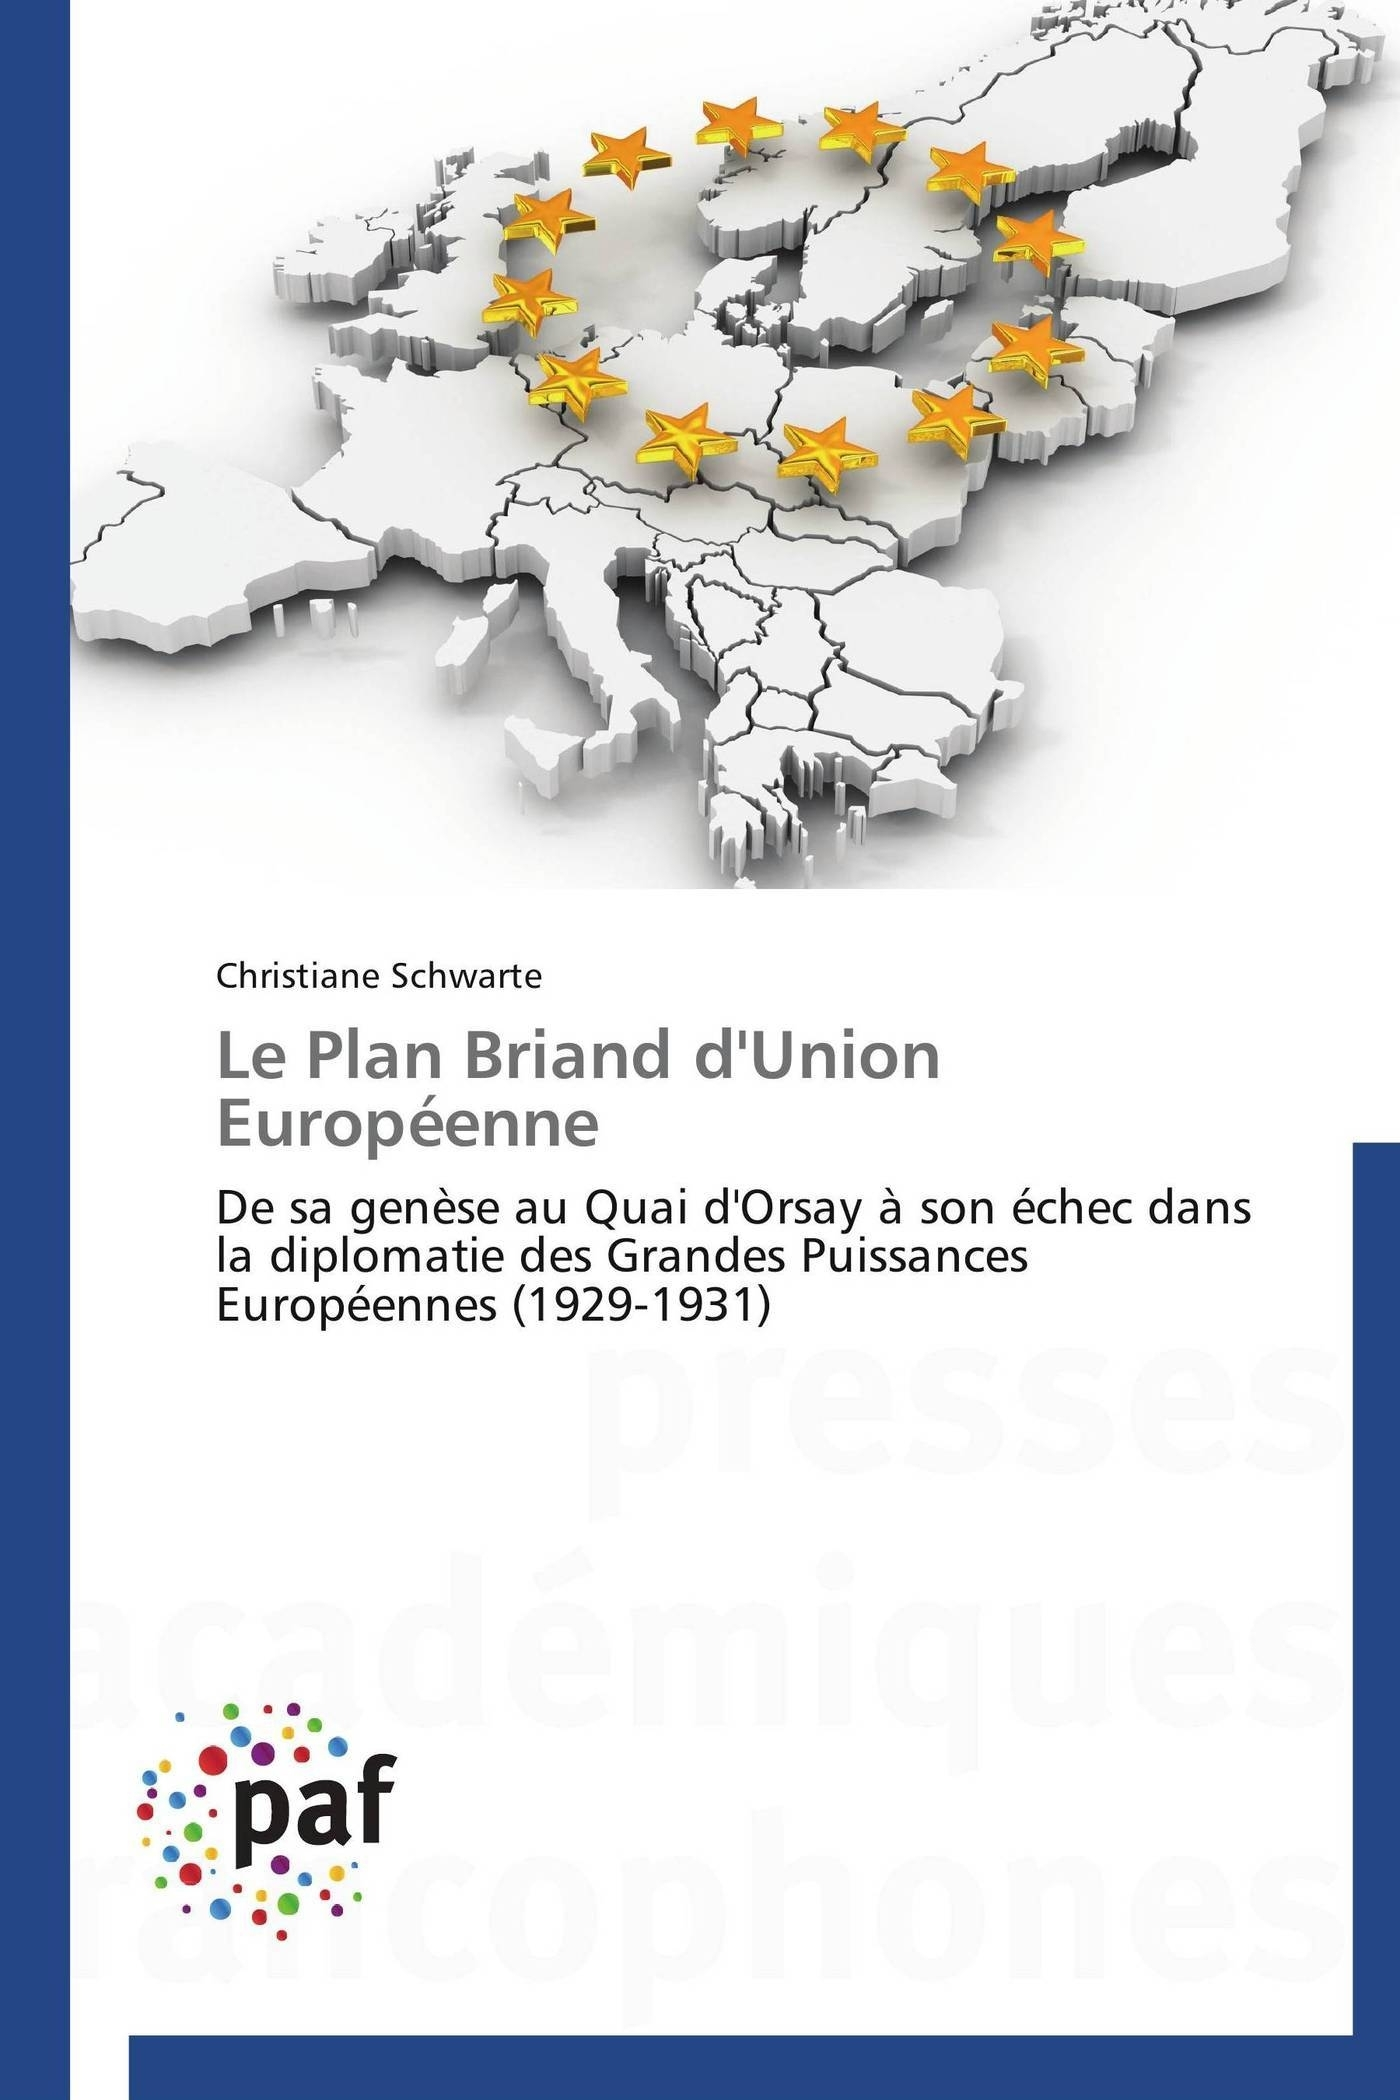 LE PLAN BRIAND D'UNION EUROPEENNE